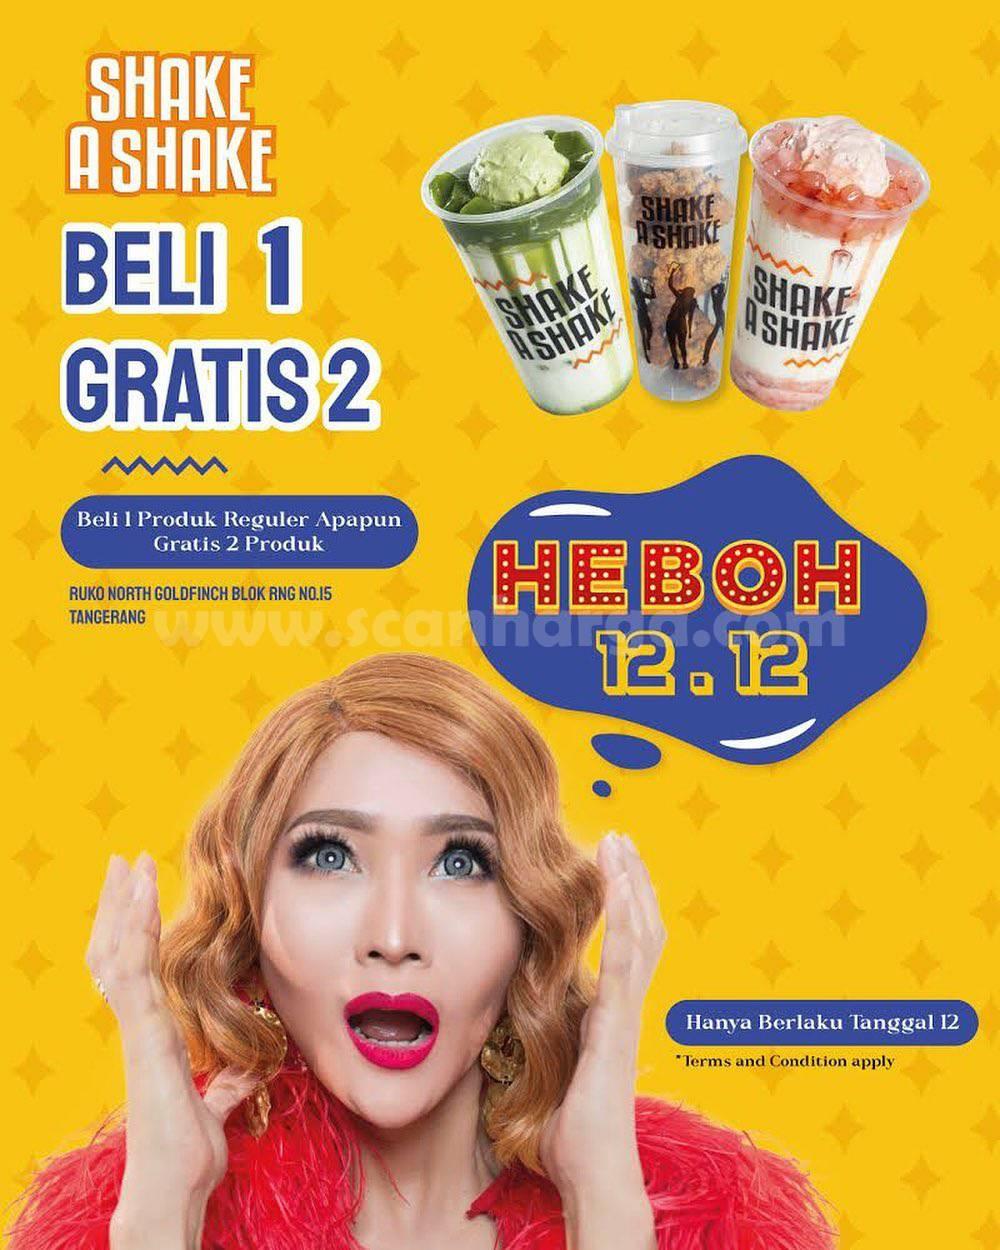 Promo Shake A Shake Heboh 12.12 Dskon Harbolnas Beli 1 Gratis 2